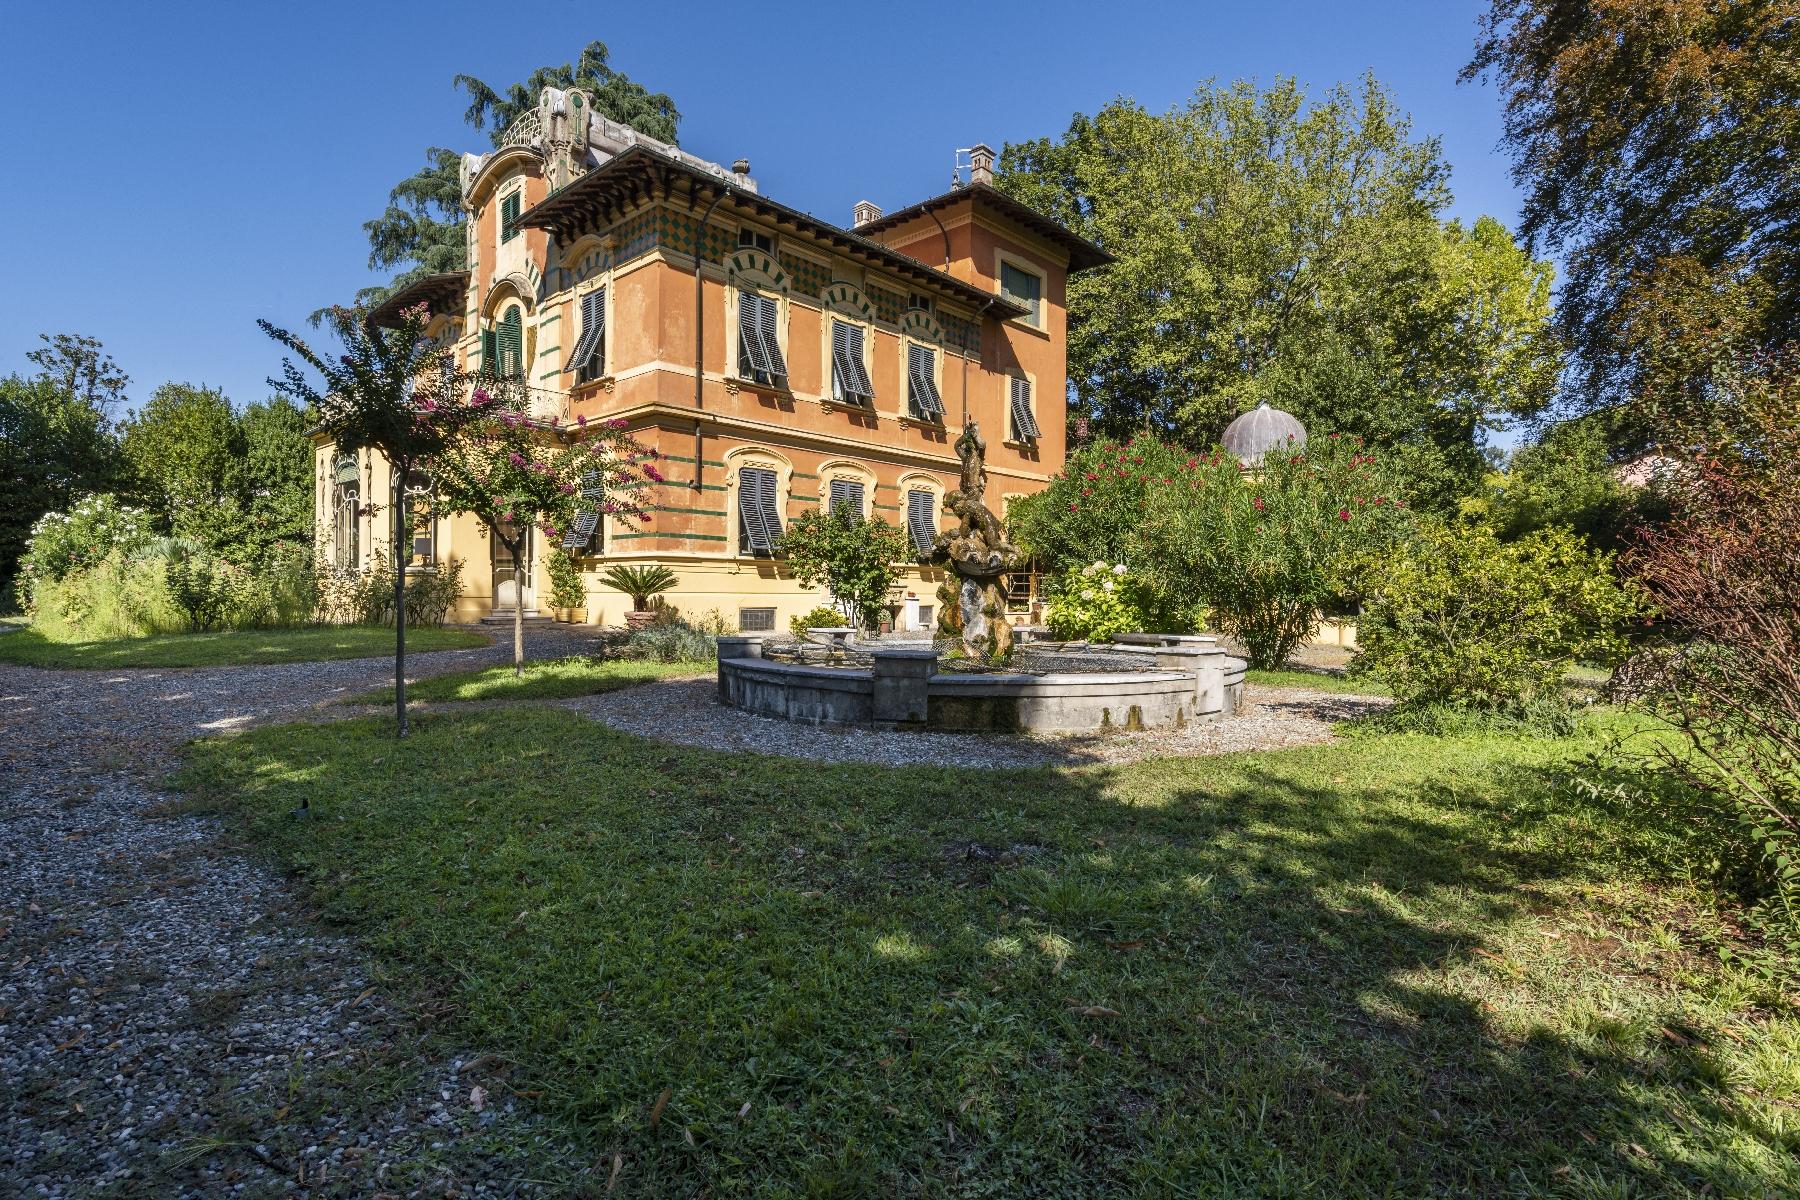 Villa in Vendita a Lucca:  5 locali, 660 mq  - Foto 1